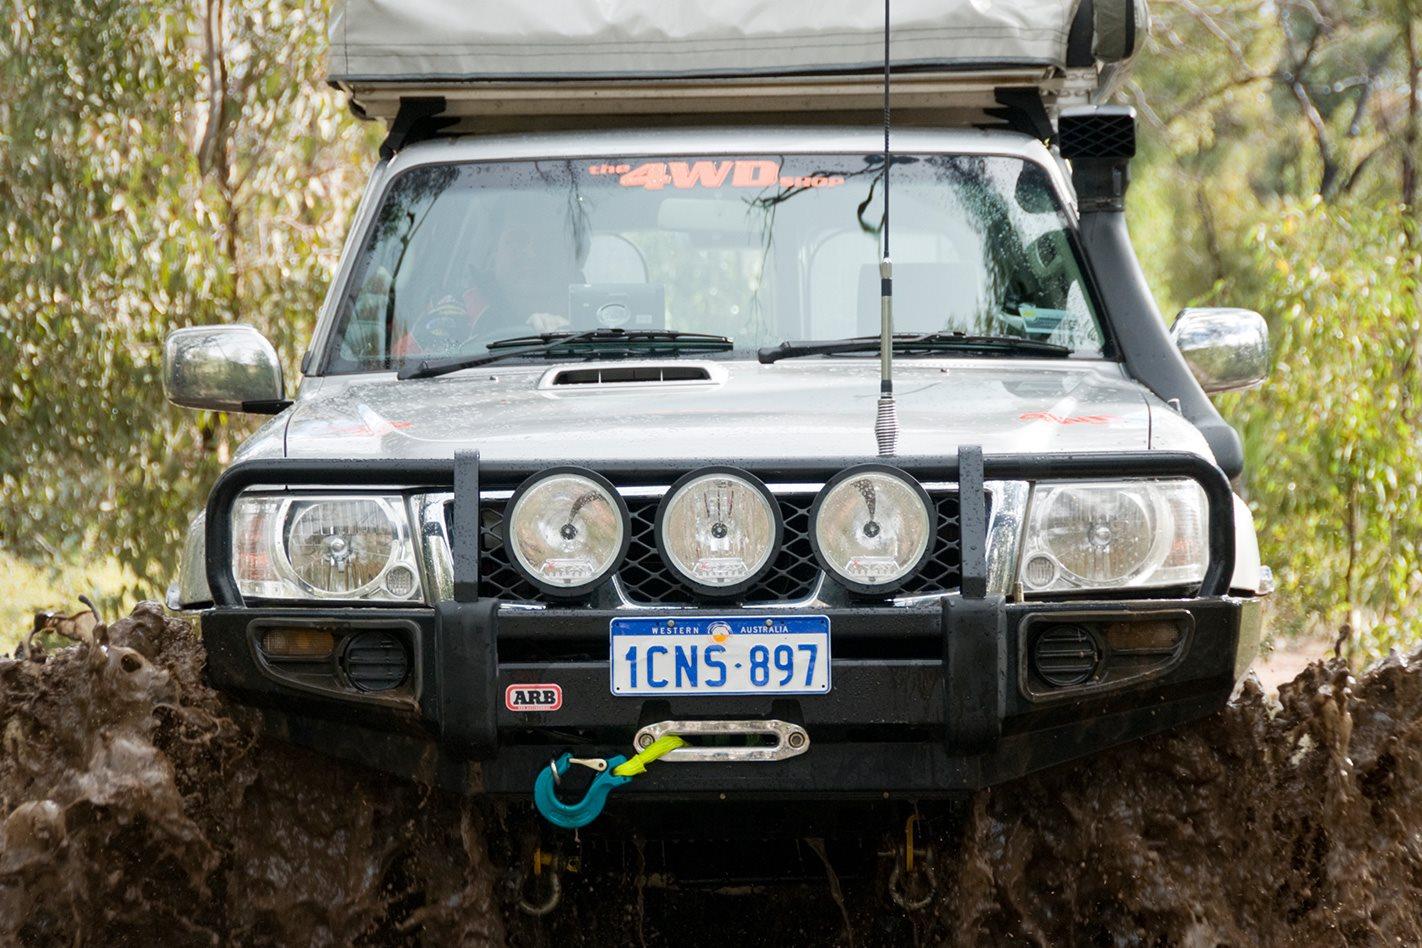 2005-Nissan-Patrol-GU-front-bullbar.jpg